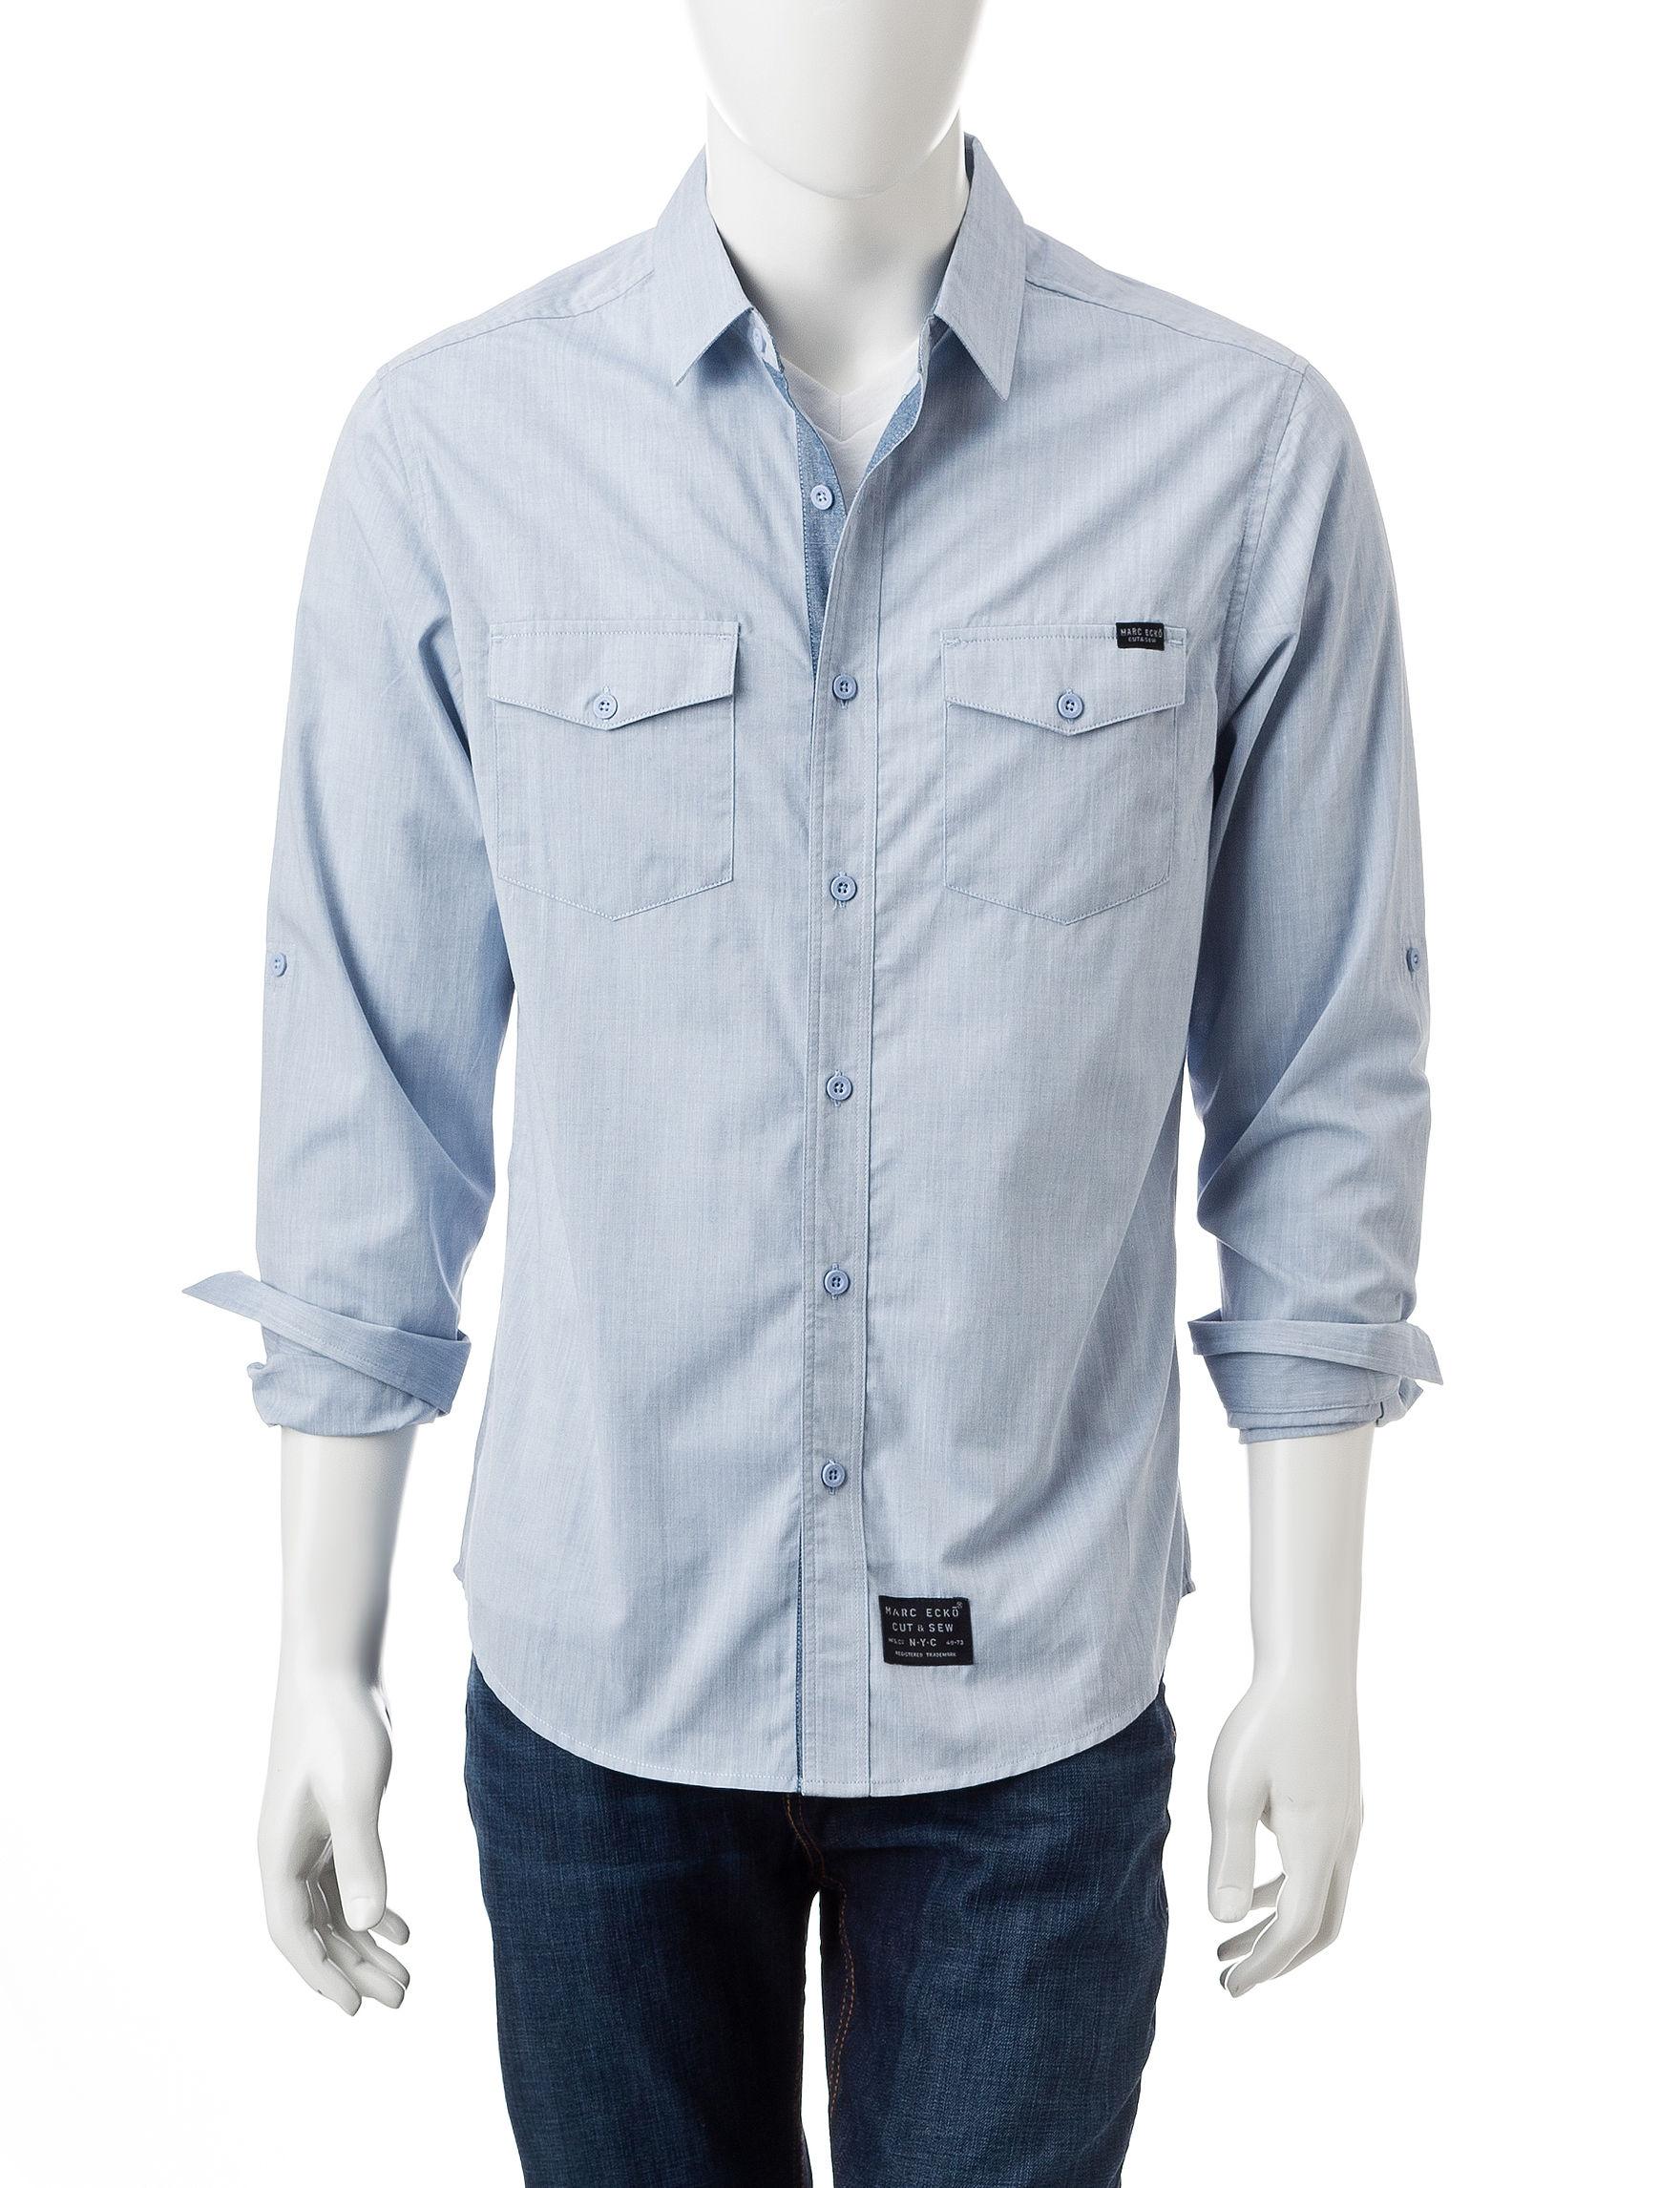 Marc Ecko Light Blue Casual Button Down Shirts